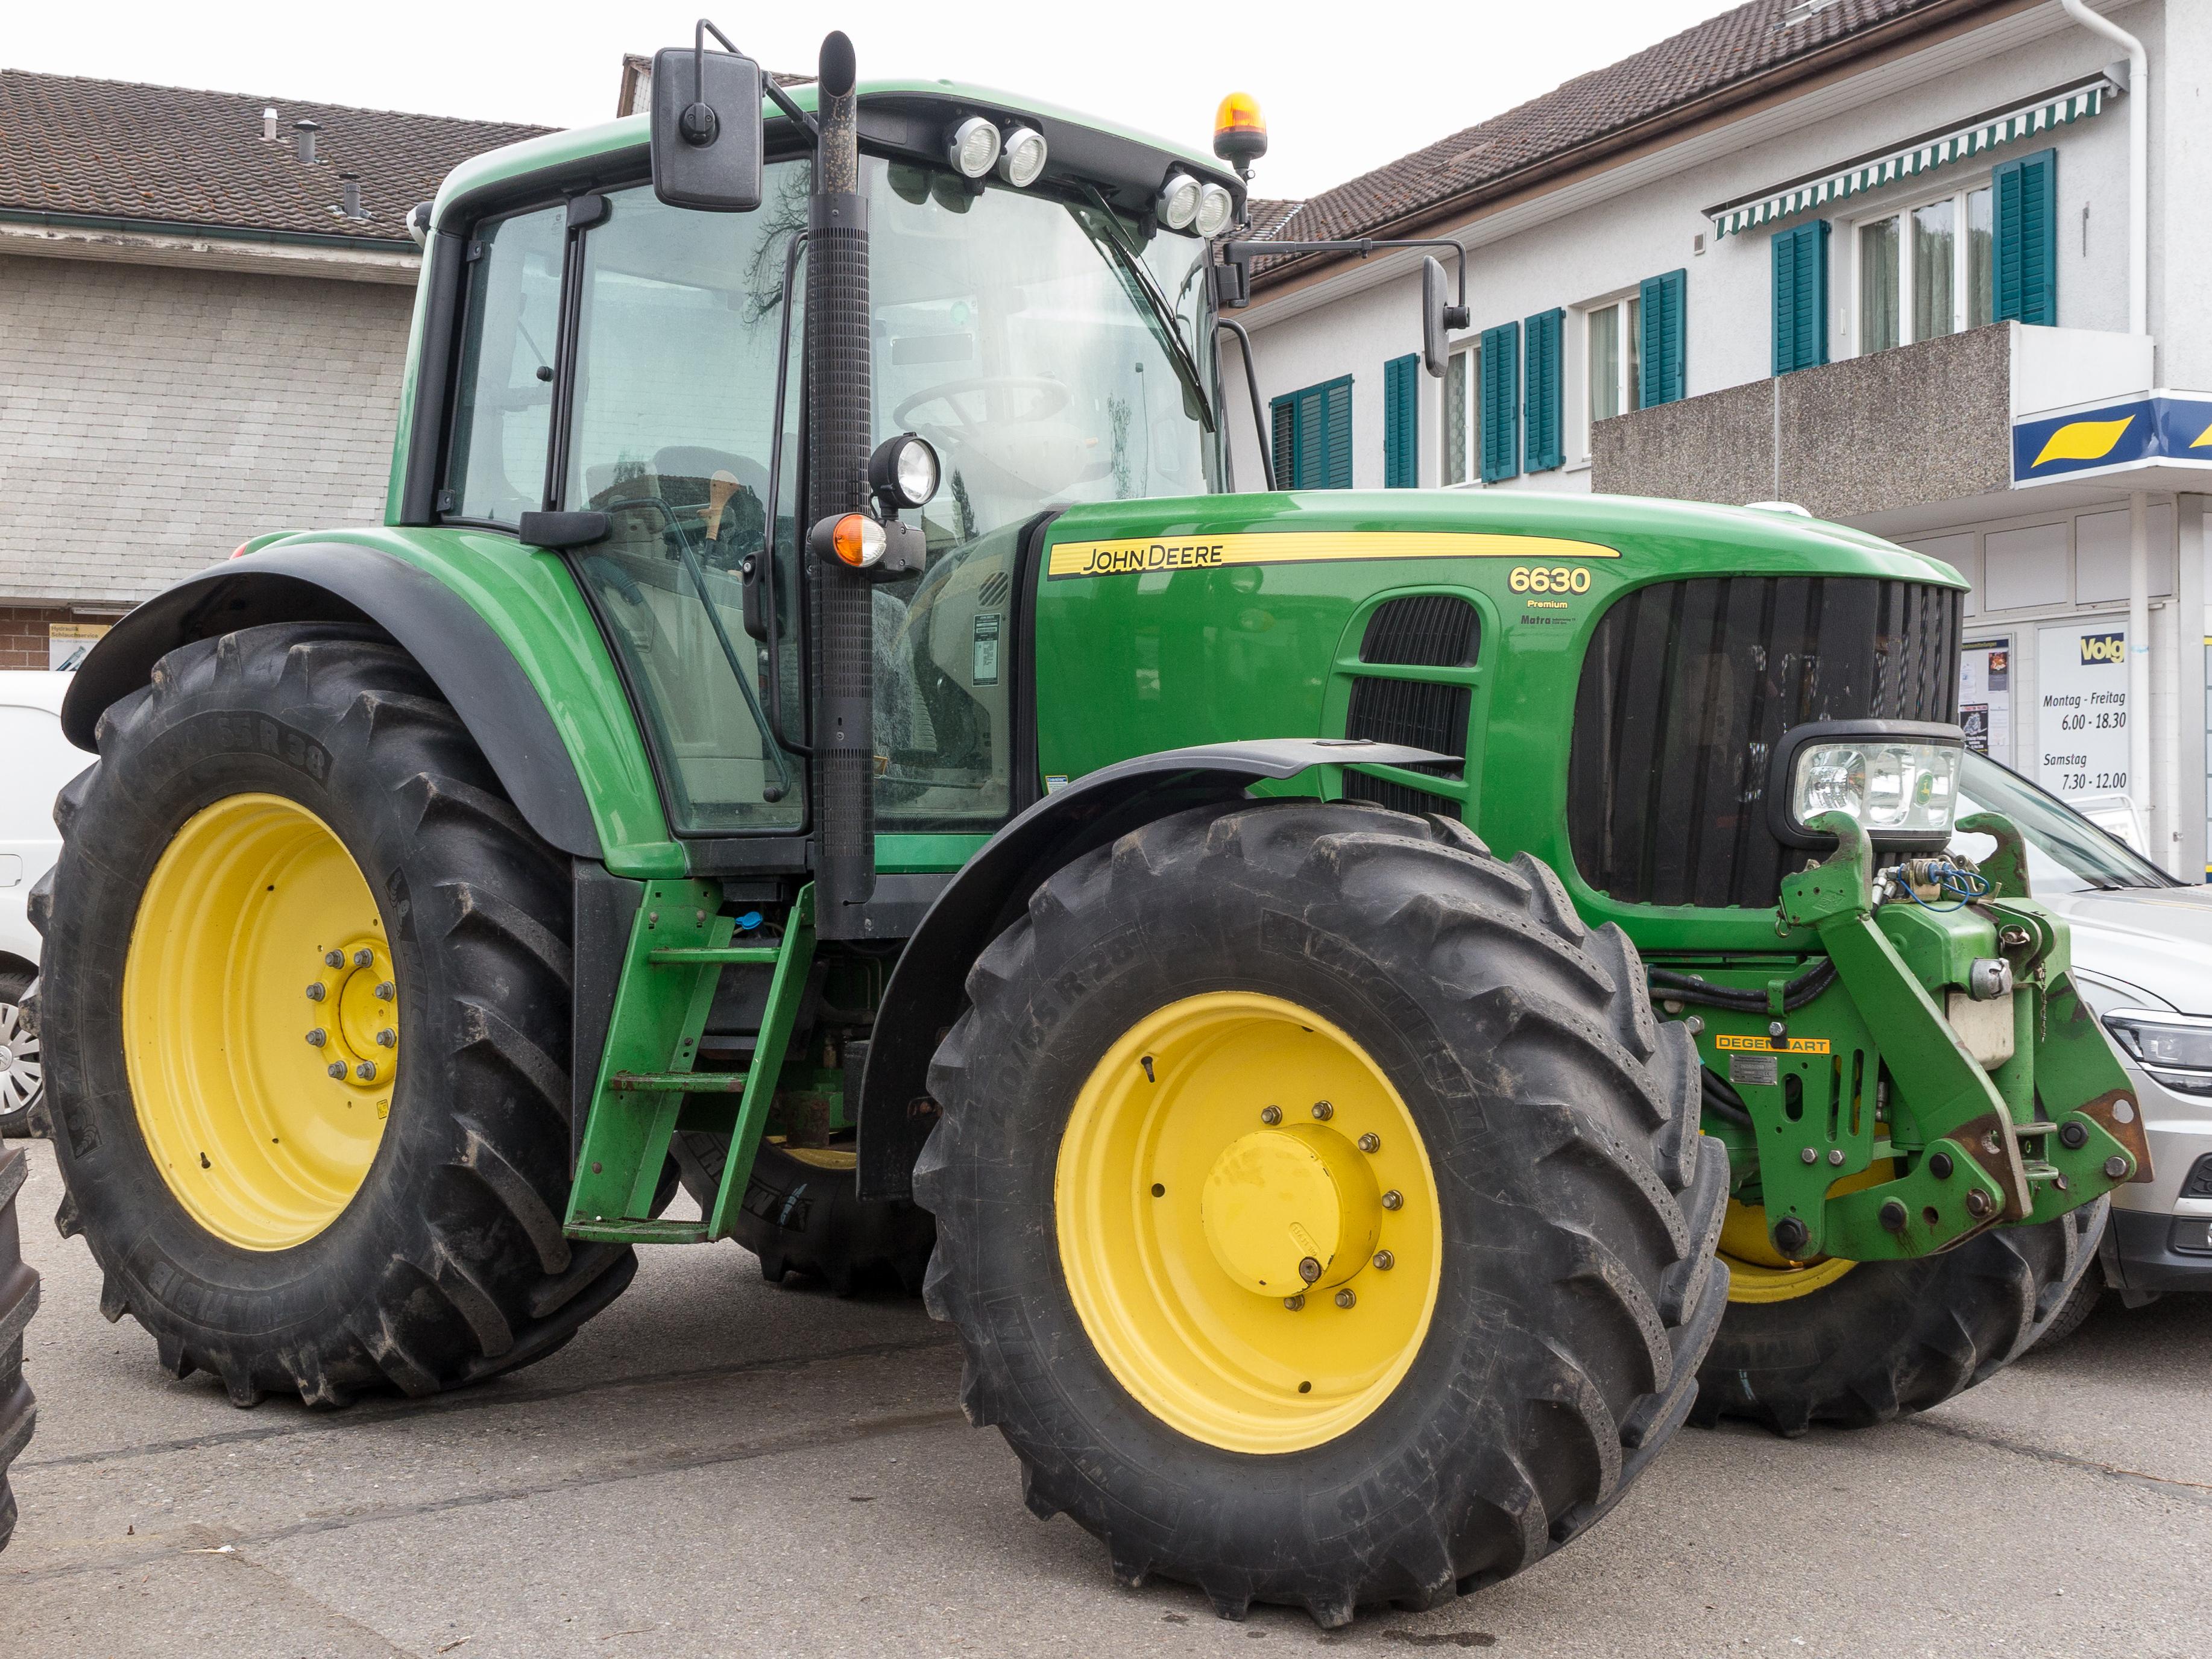 datei:john deere 6630 traktor - wikibooks, sammlung